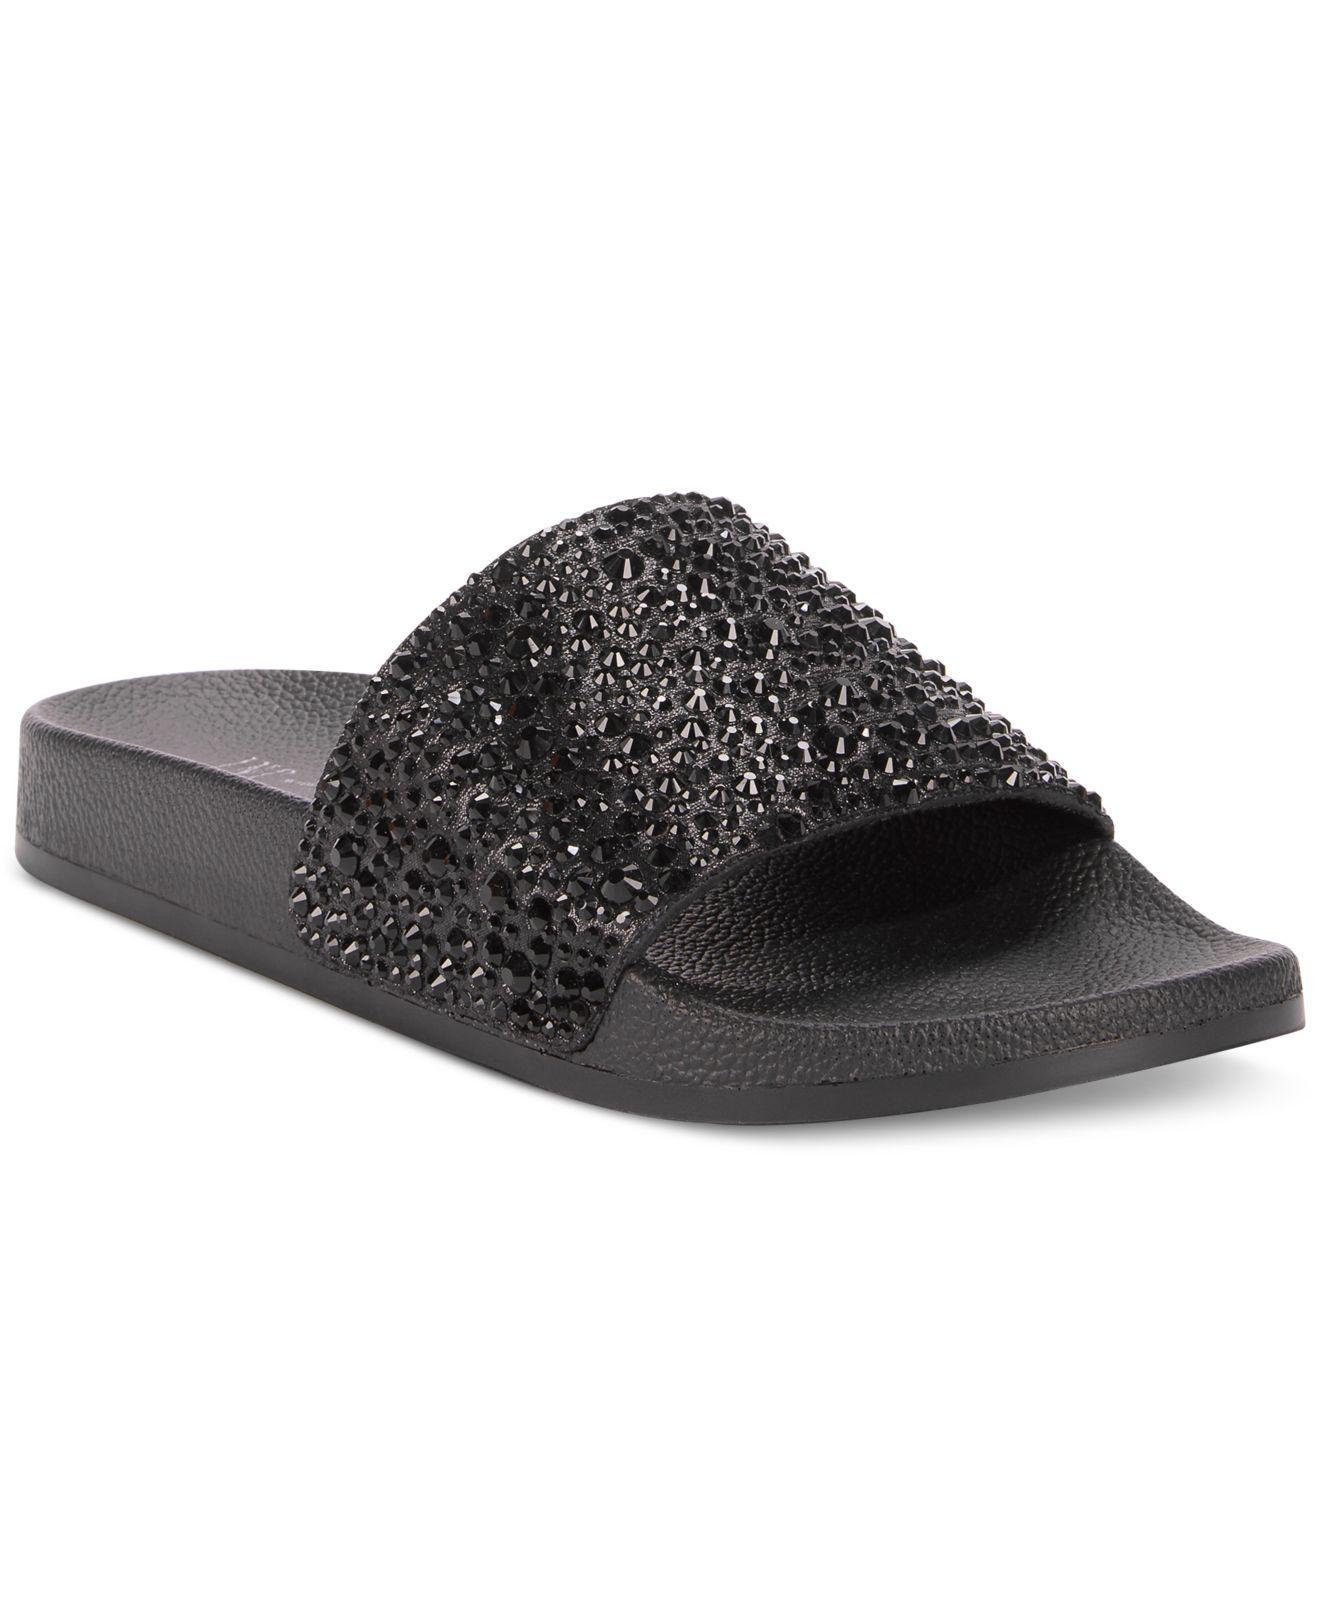 9f3bb543f9e754 Lyst - INC International Concepts Women s Peymin Flat Slide Sandals ...